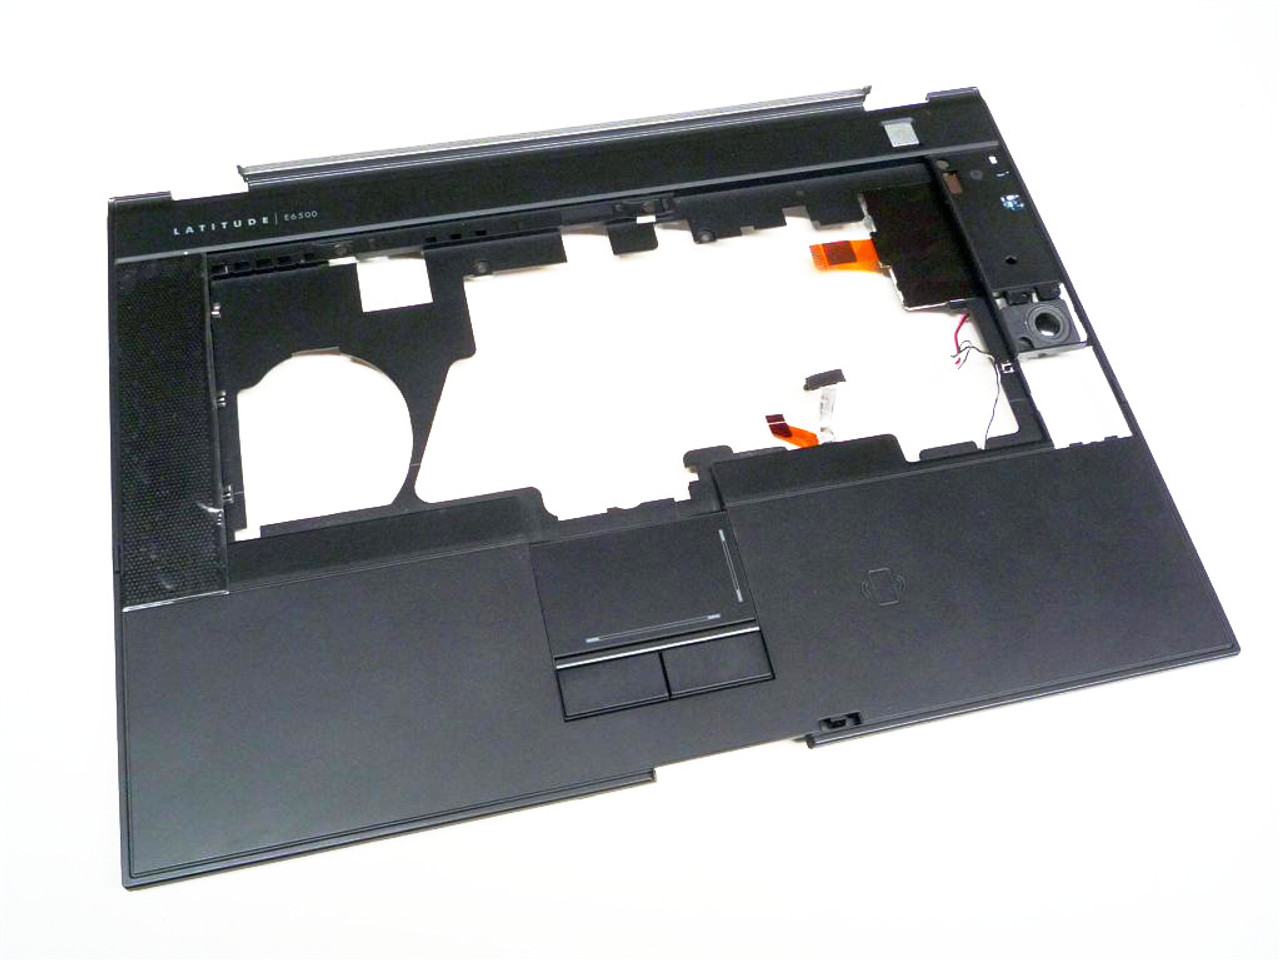 DELL E6500 SMART CARD READER DOWNLOAD DRIVERS